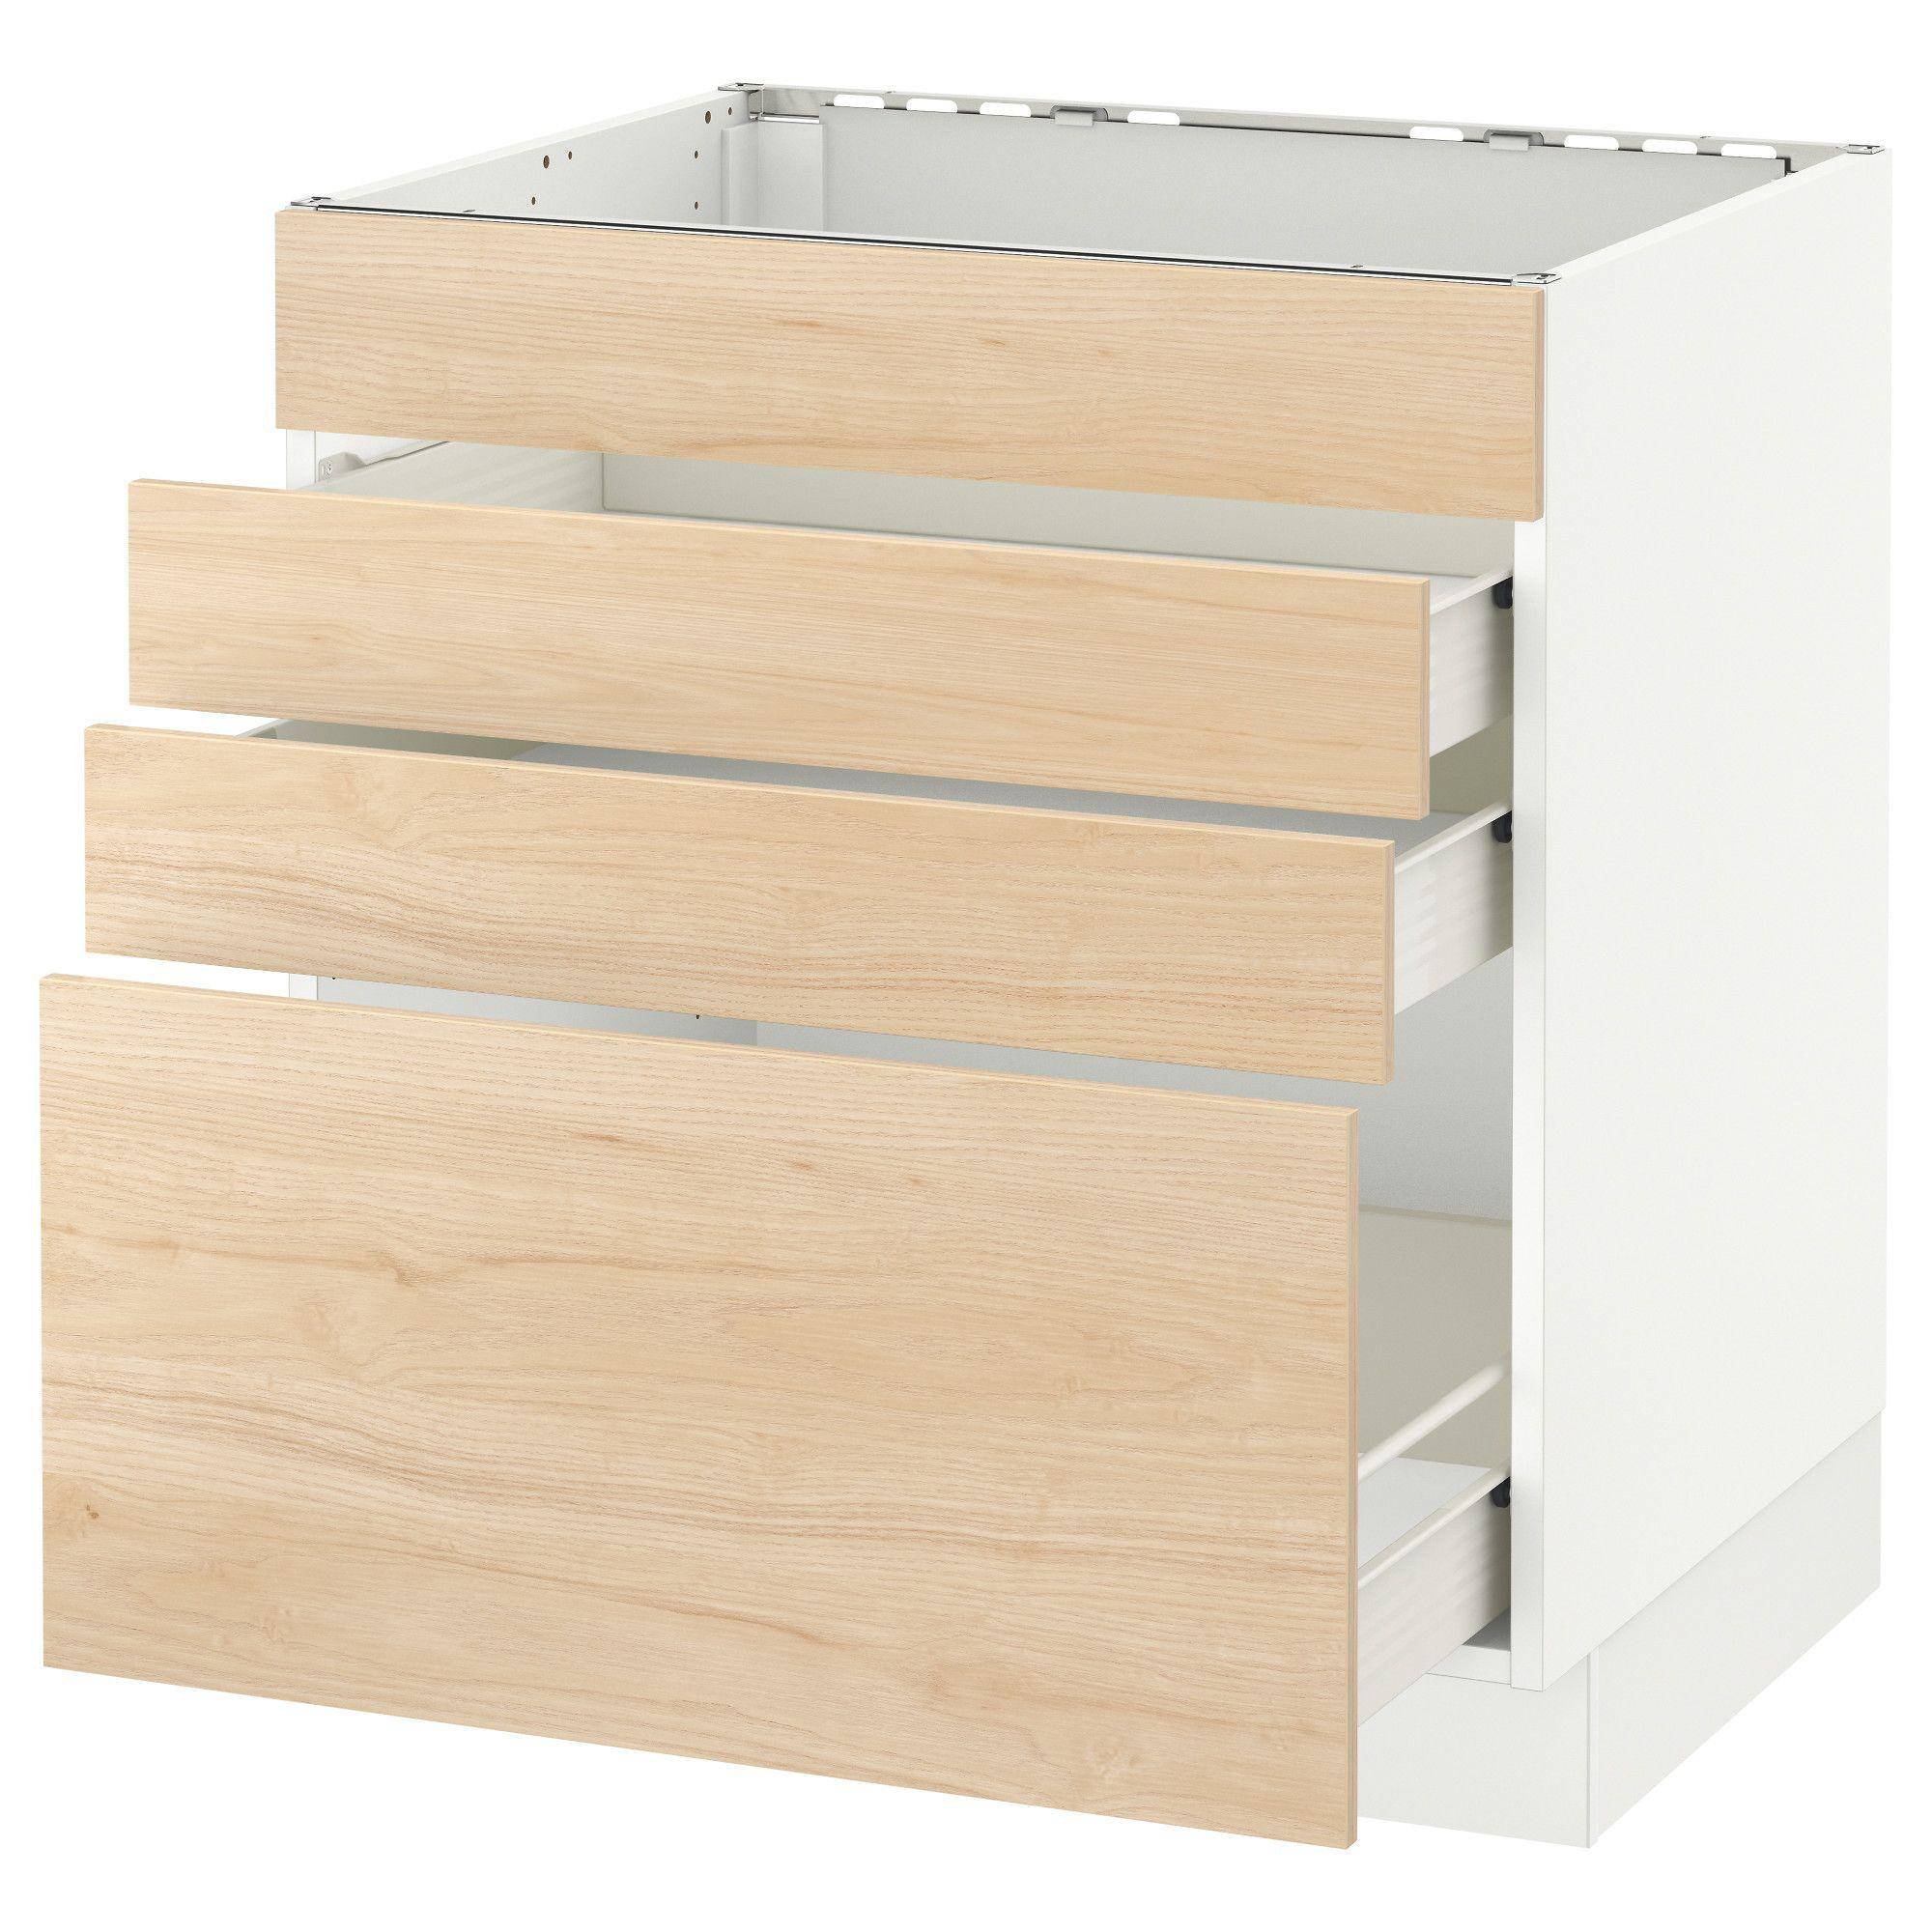 Ikea Sektion Cabinets Installation